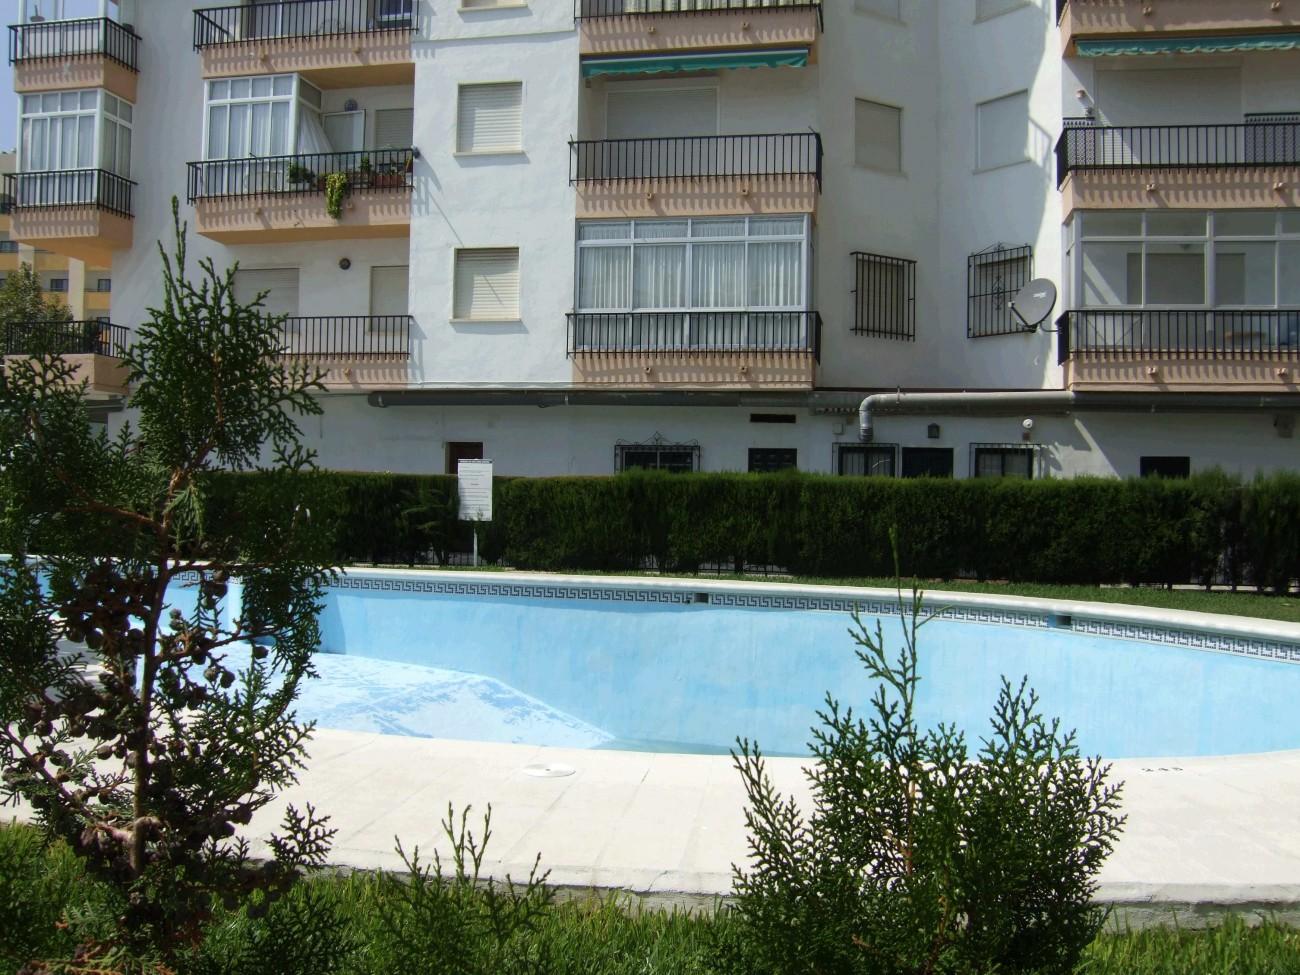 Apartment for rent in Nerja, Málaga, Spain